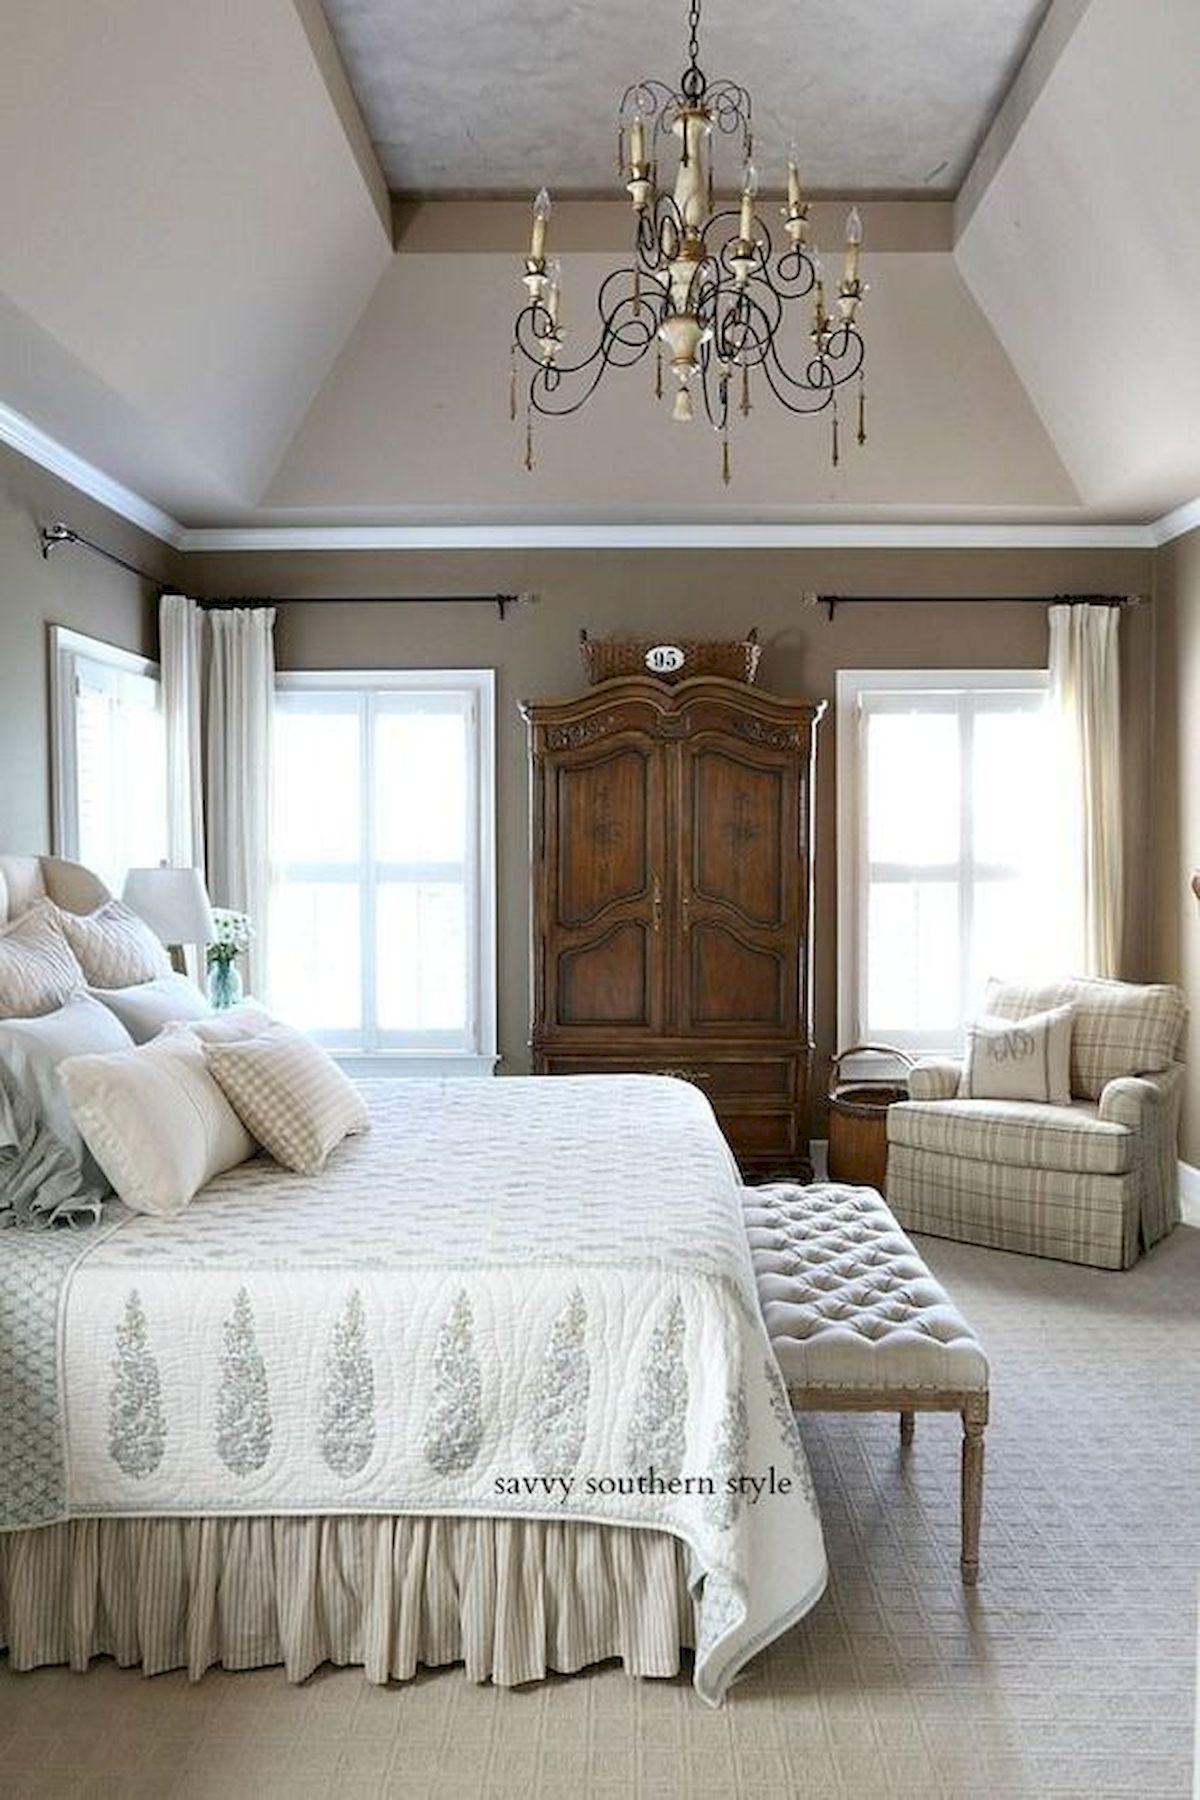 37 Simple Summer Bedroom Decor Ideas (20)